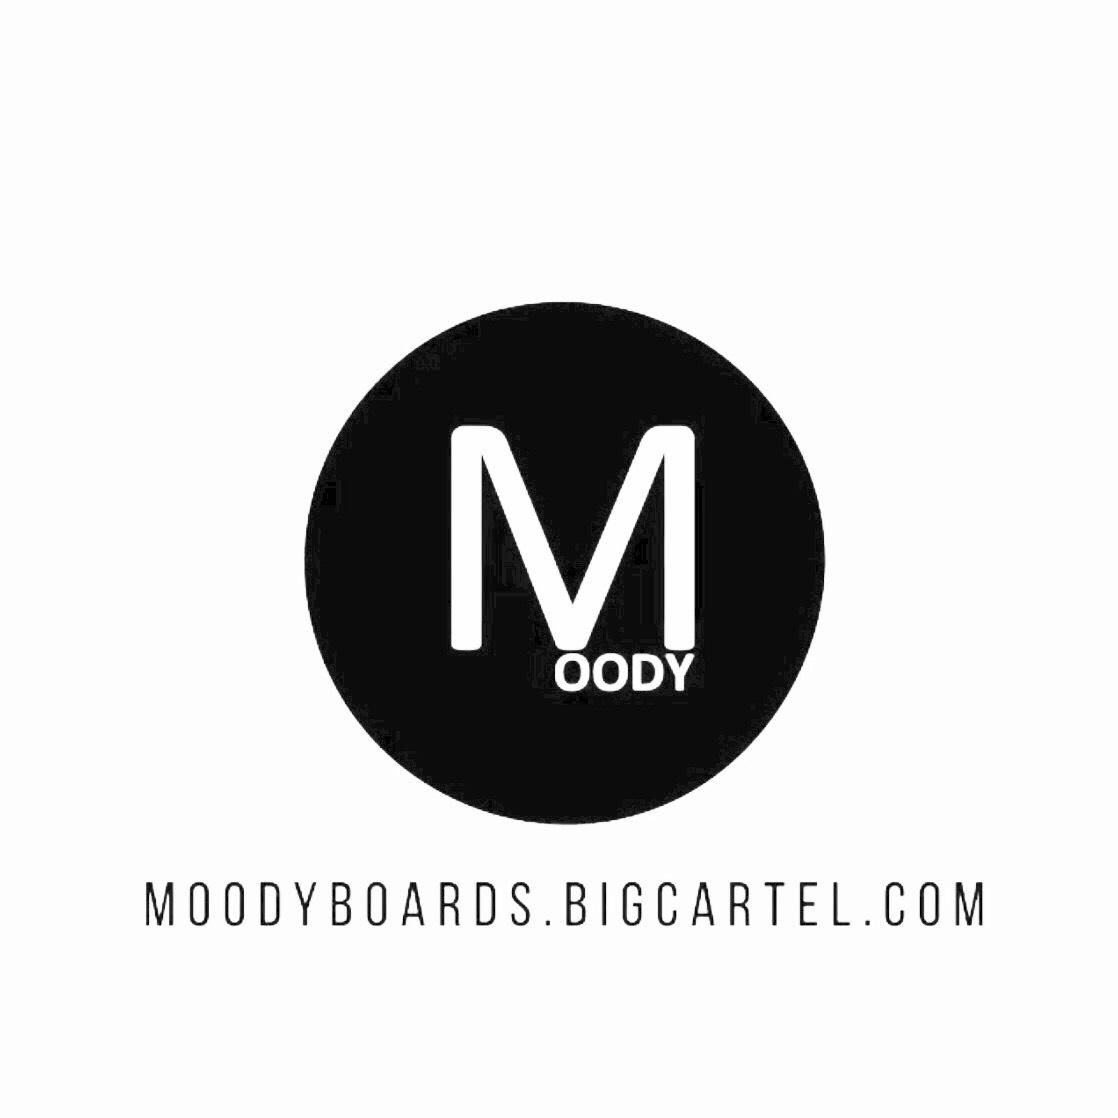 http://moodyboards.bigcartel.com/